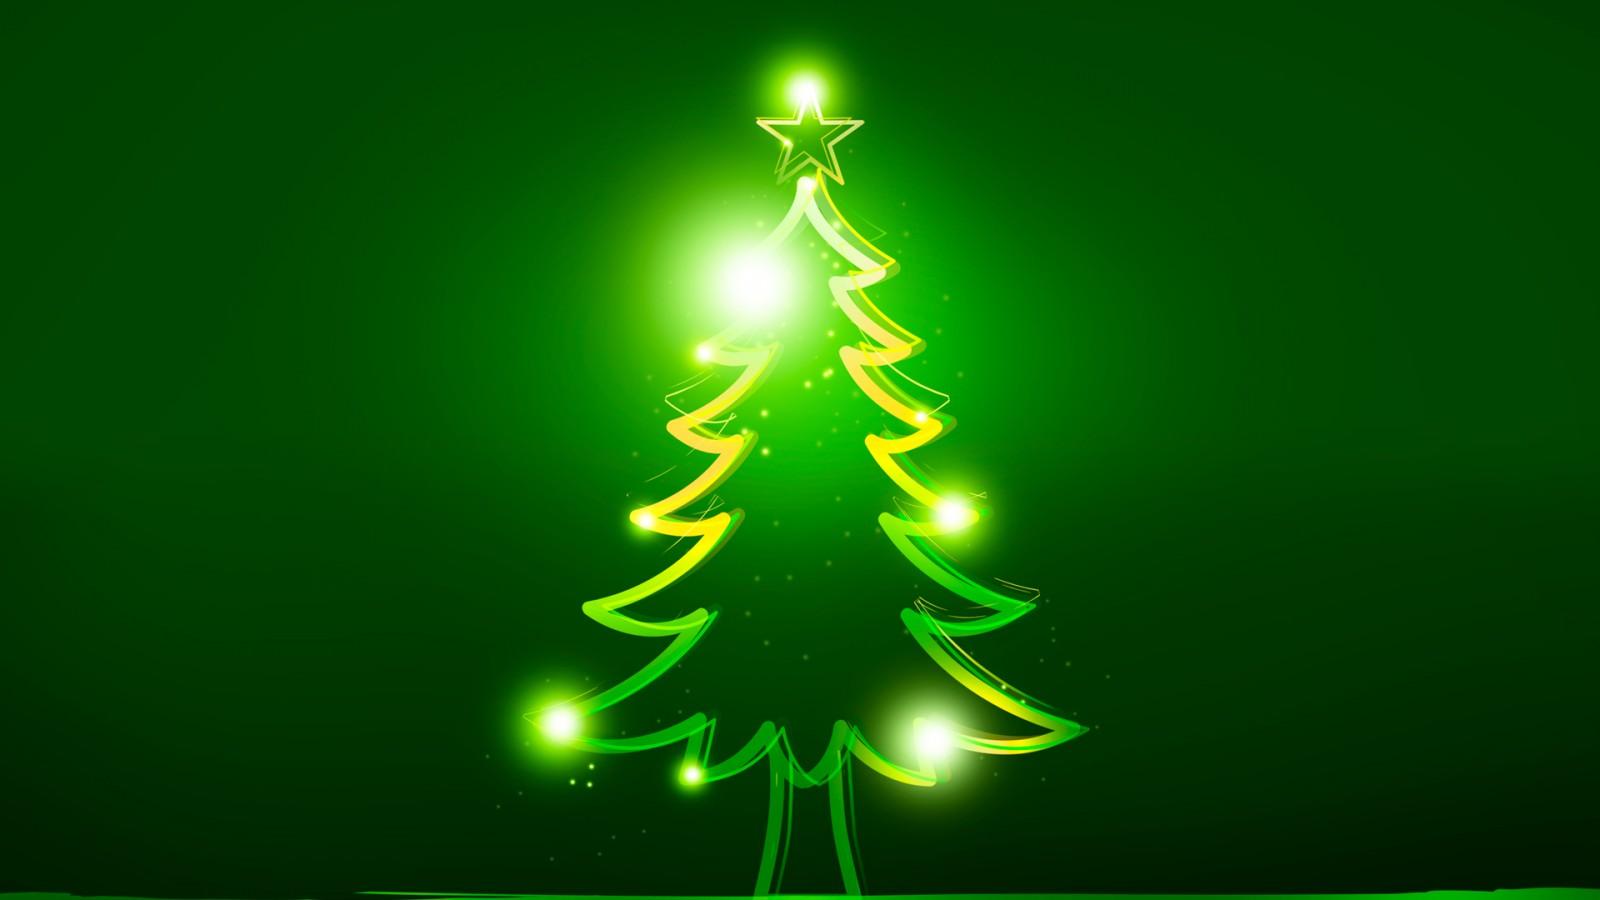 Green Christmas Tree With Bulbs 1600x900 - Wallpaper ...